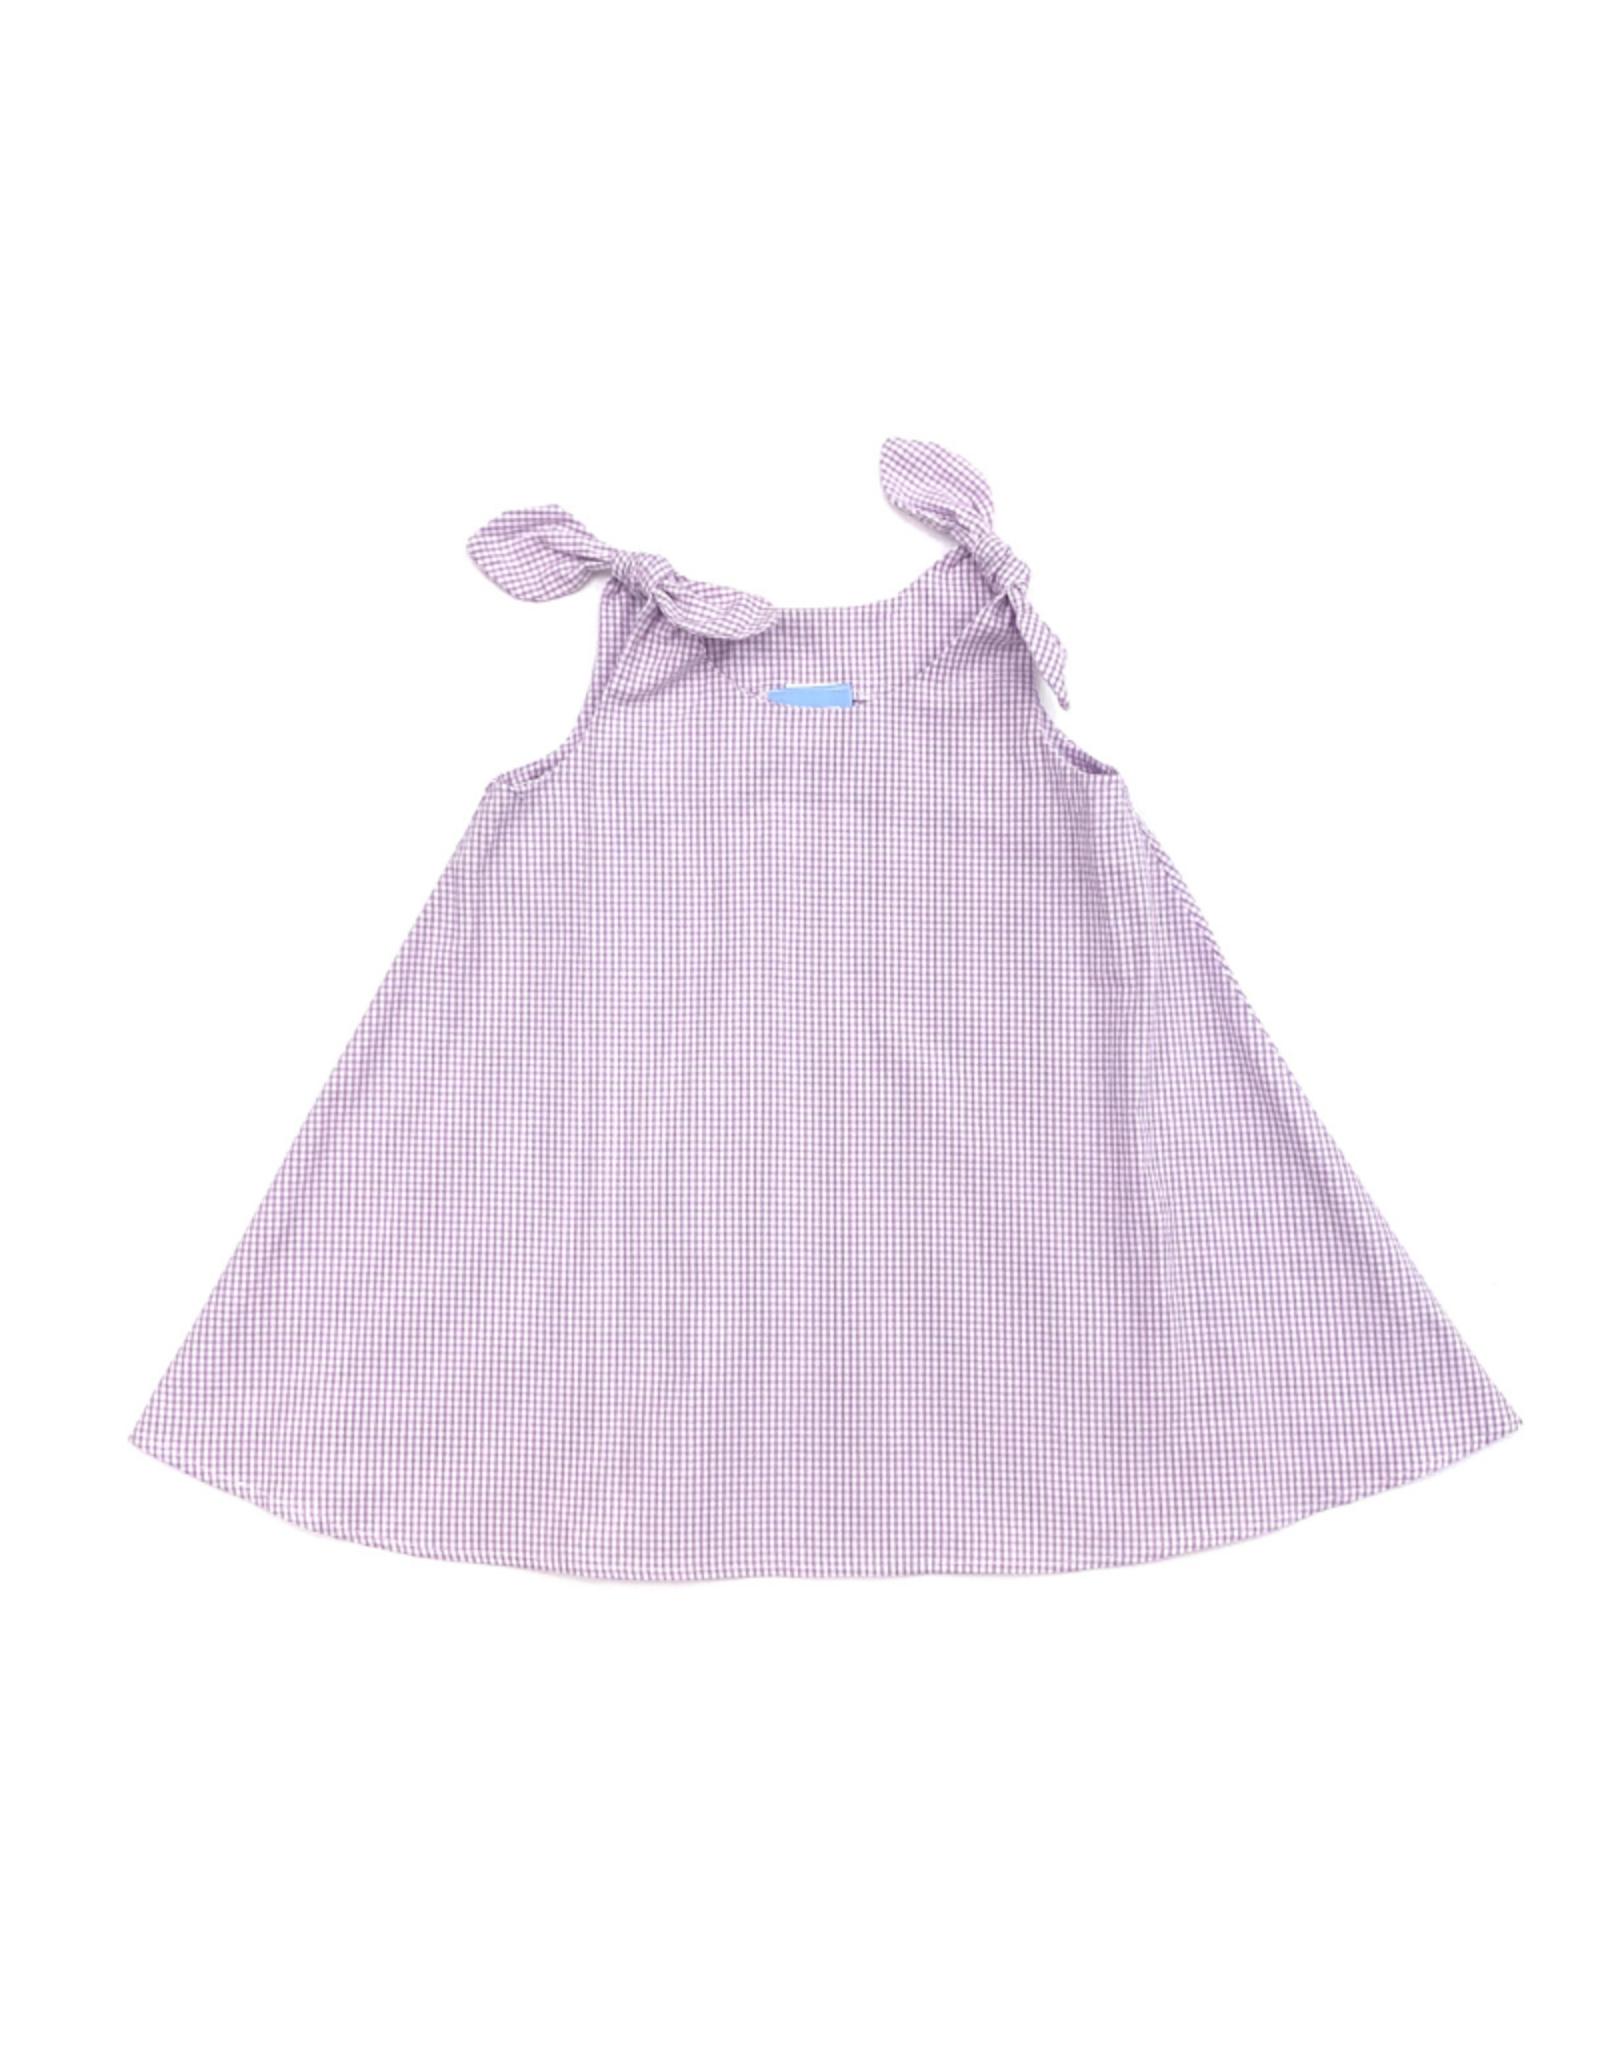 Funtasia Too Lavender Swing Dress Tie Shoulder